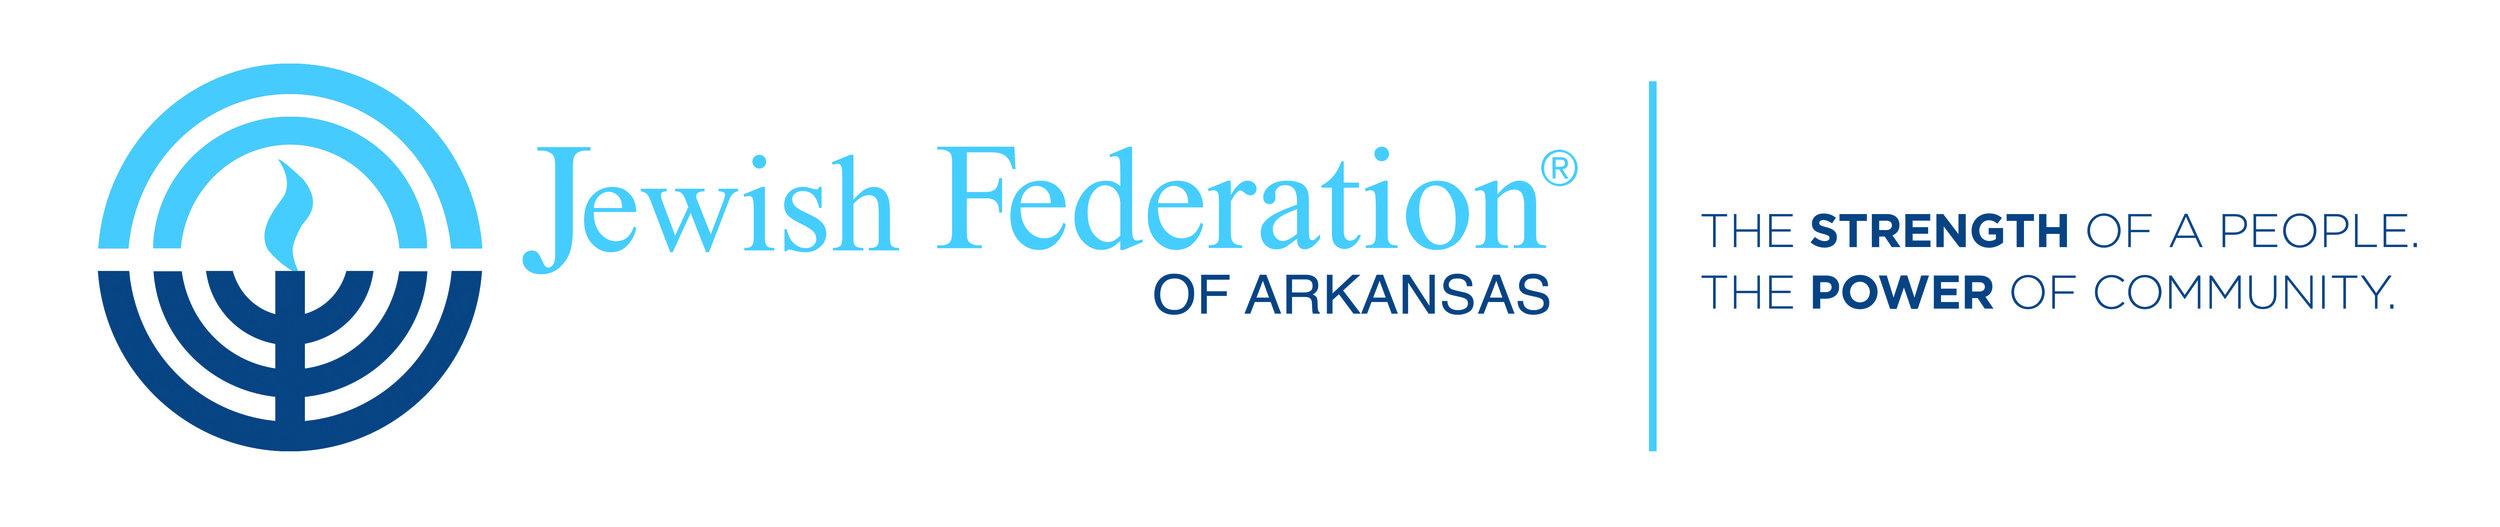 JFAR Logo most recent high res.jpg